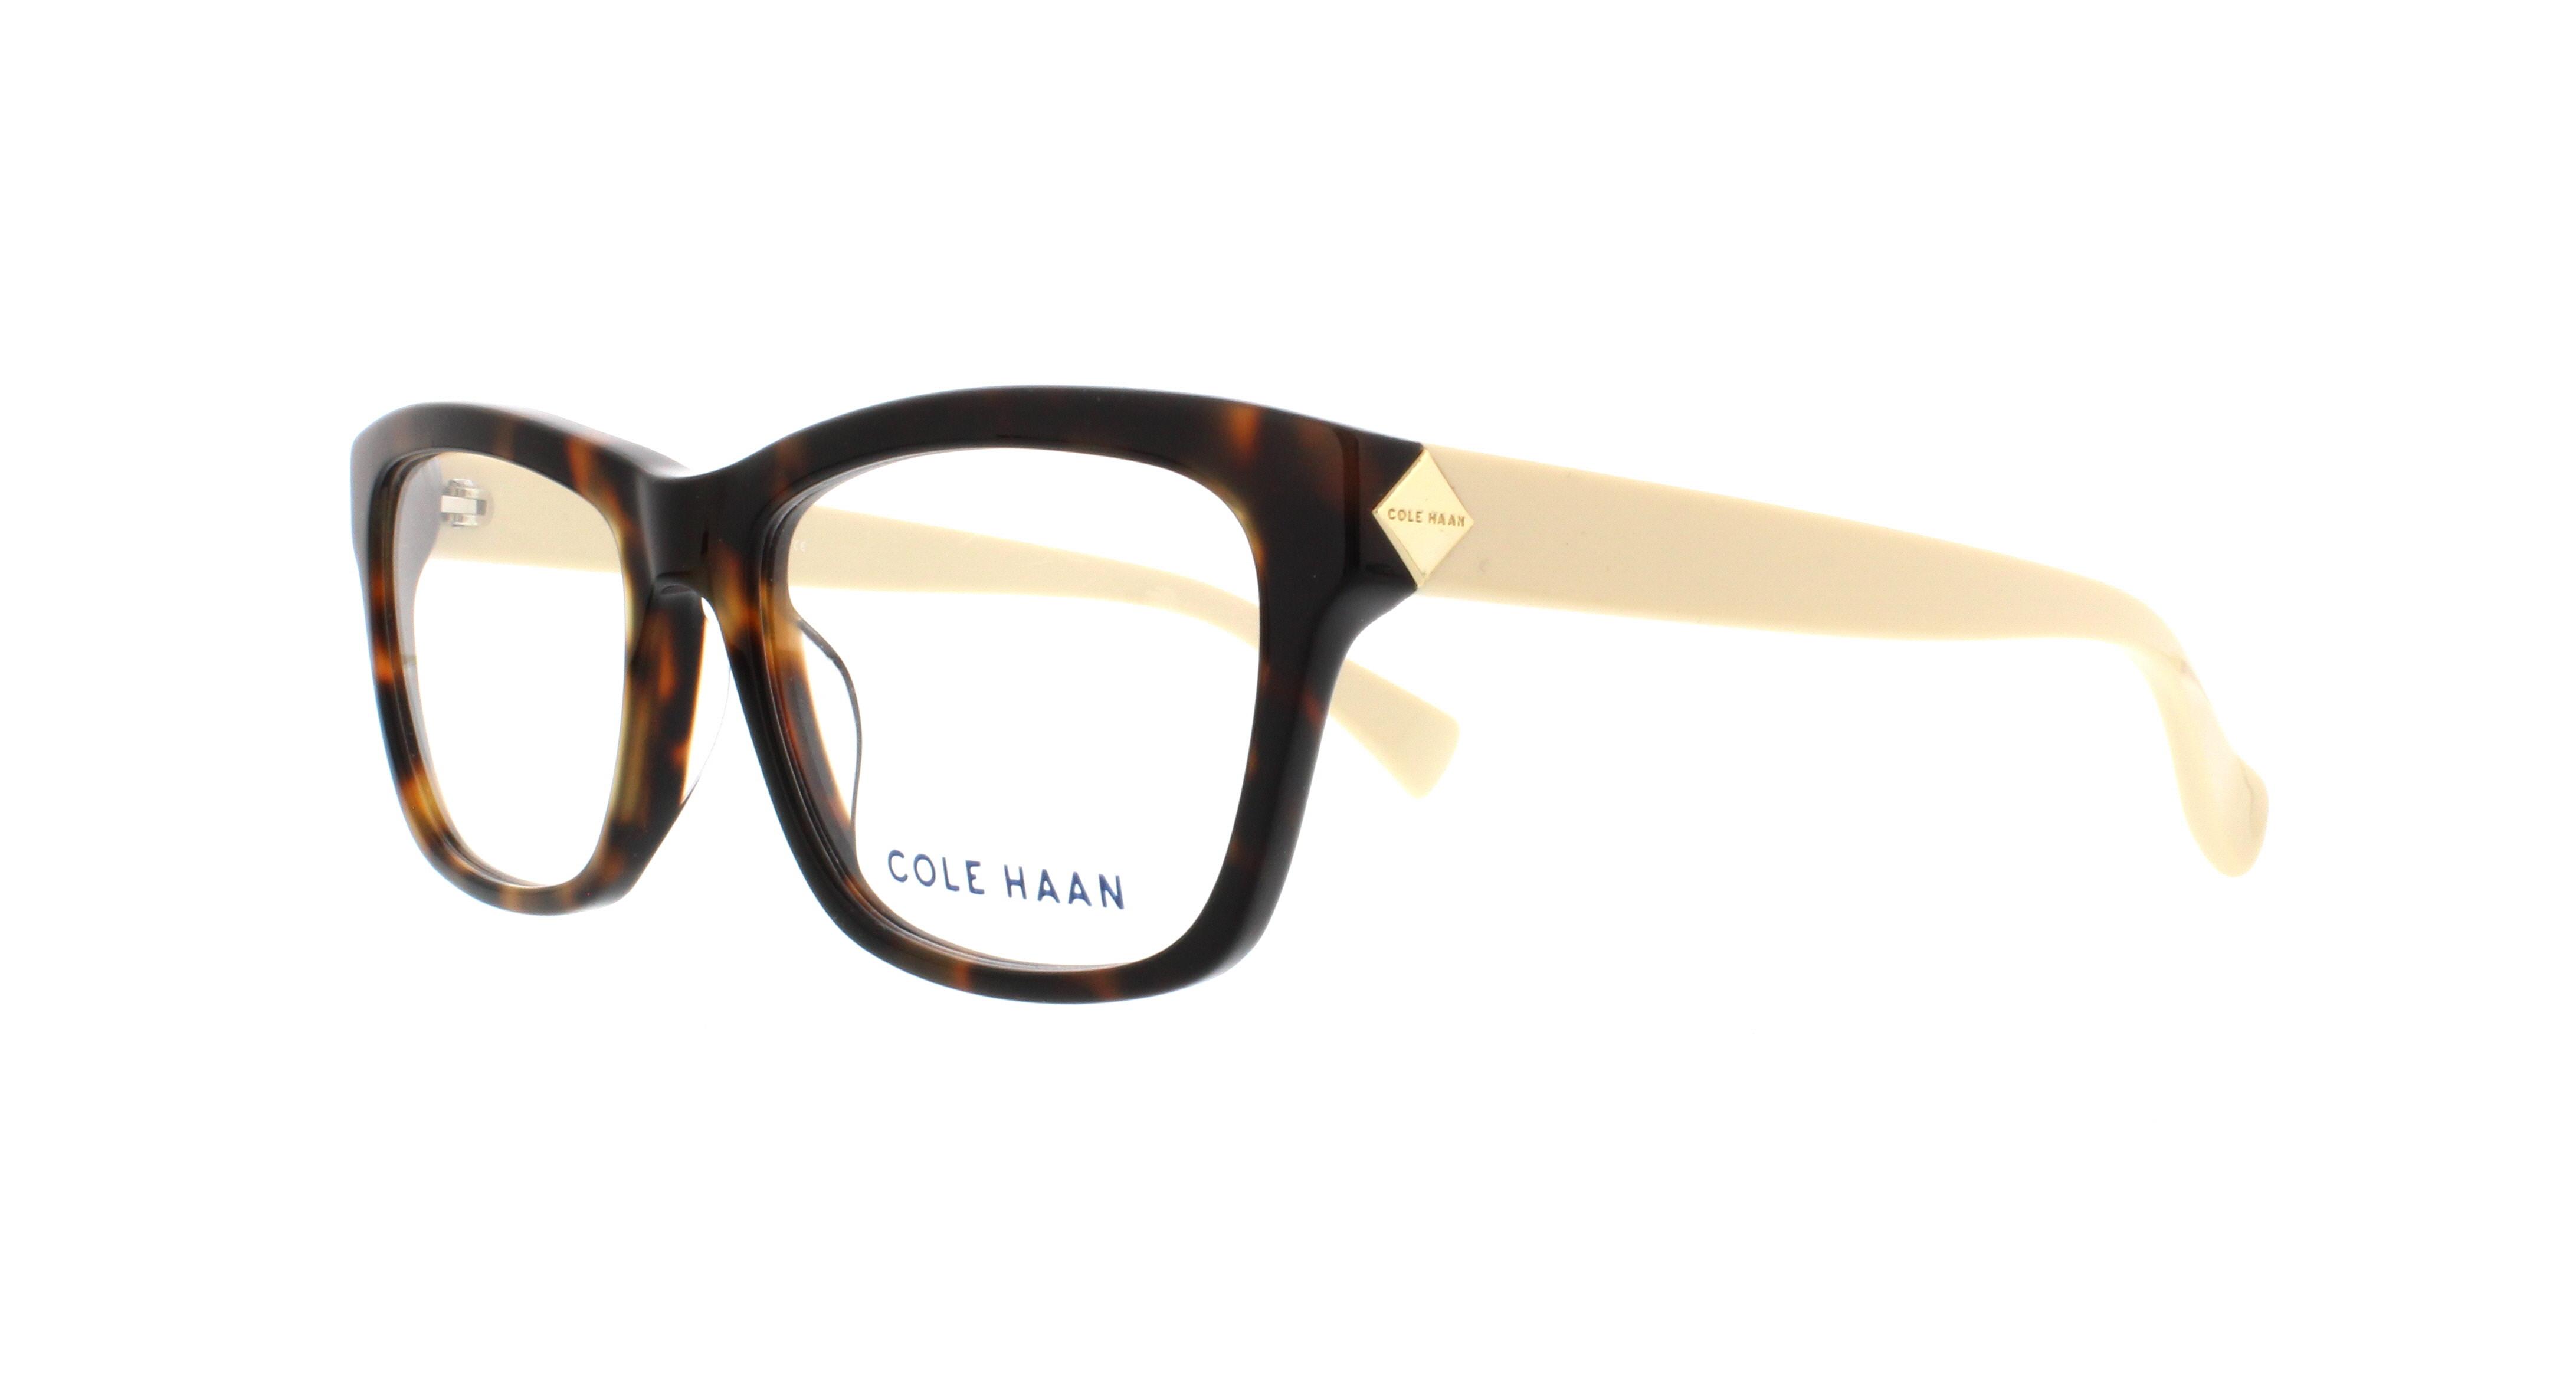 COLE HAAN Eyeglasses CH5007 240 Soft Tortoise 53MM 788678035530 | eBay